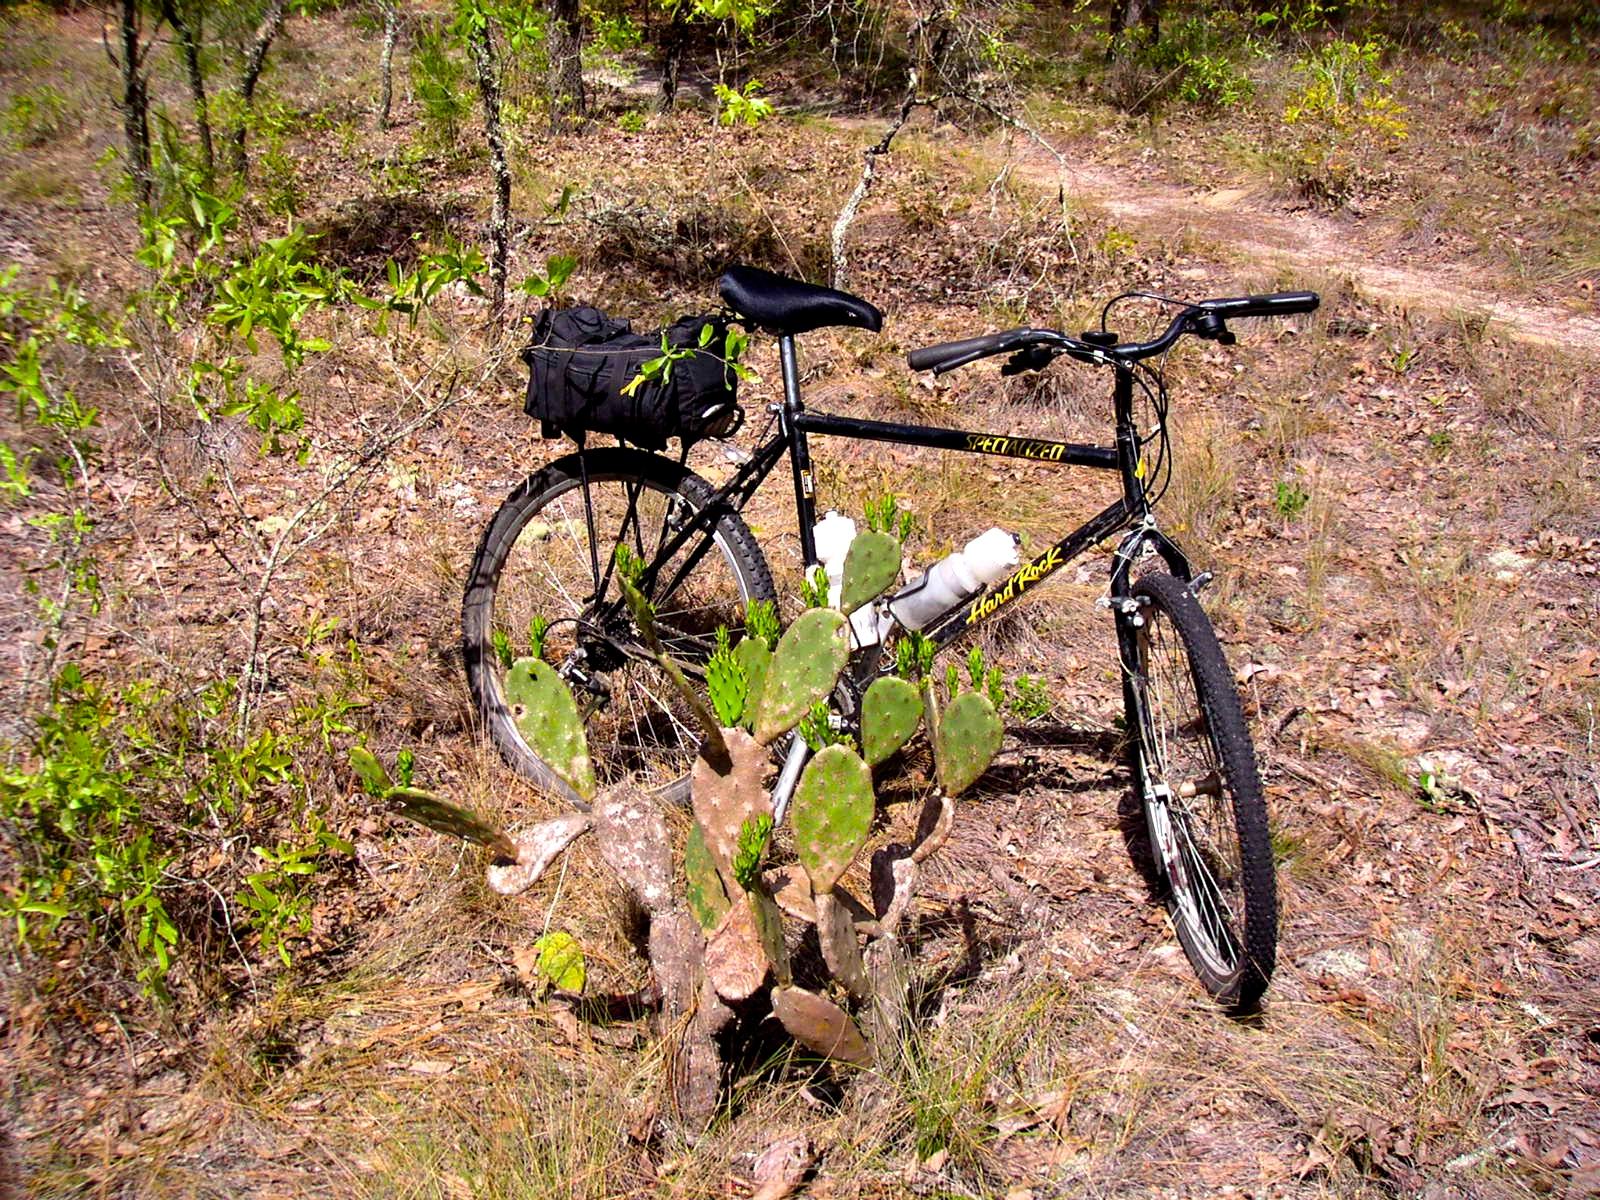 Chuck S Adventures Biking Florida S Paisley Woods Mountain Bike Trail